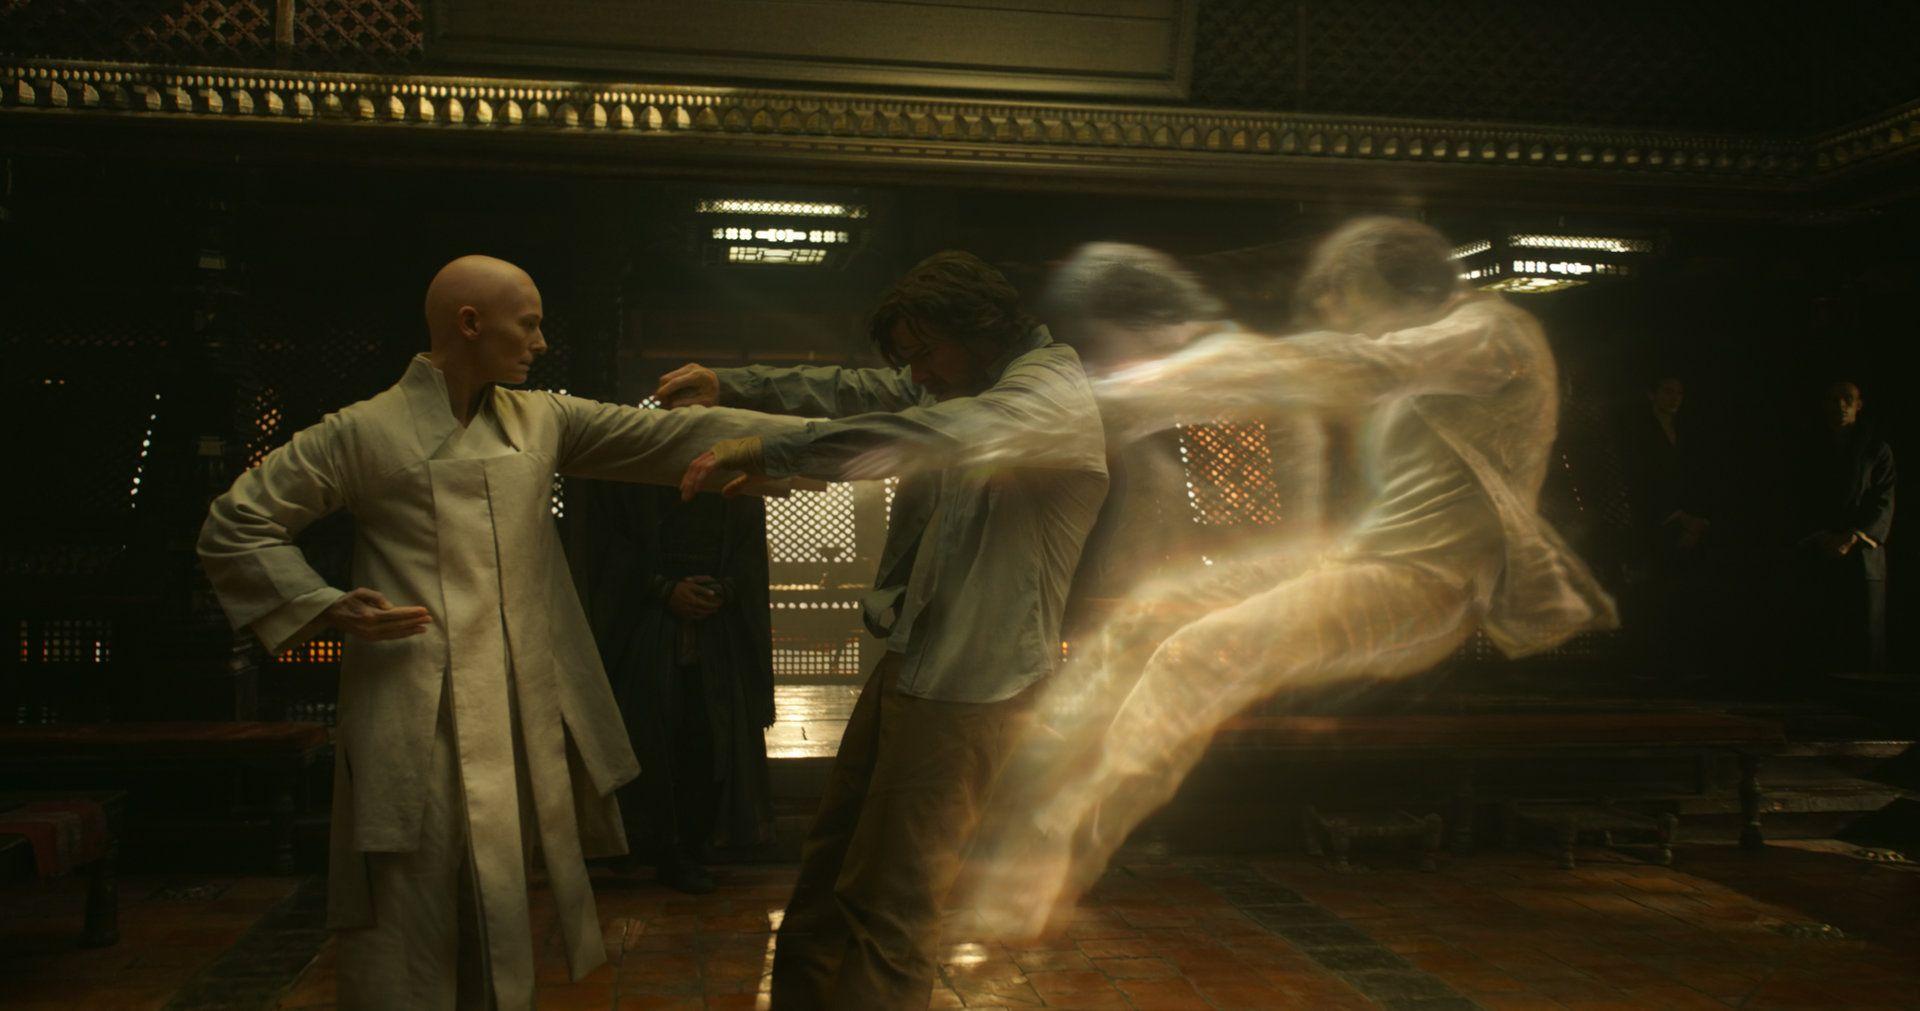 Marvel Studios Releases High Quality Doctor Strange Stills